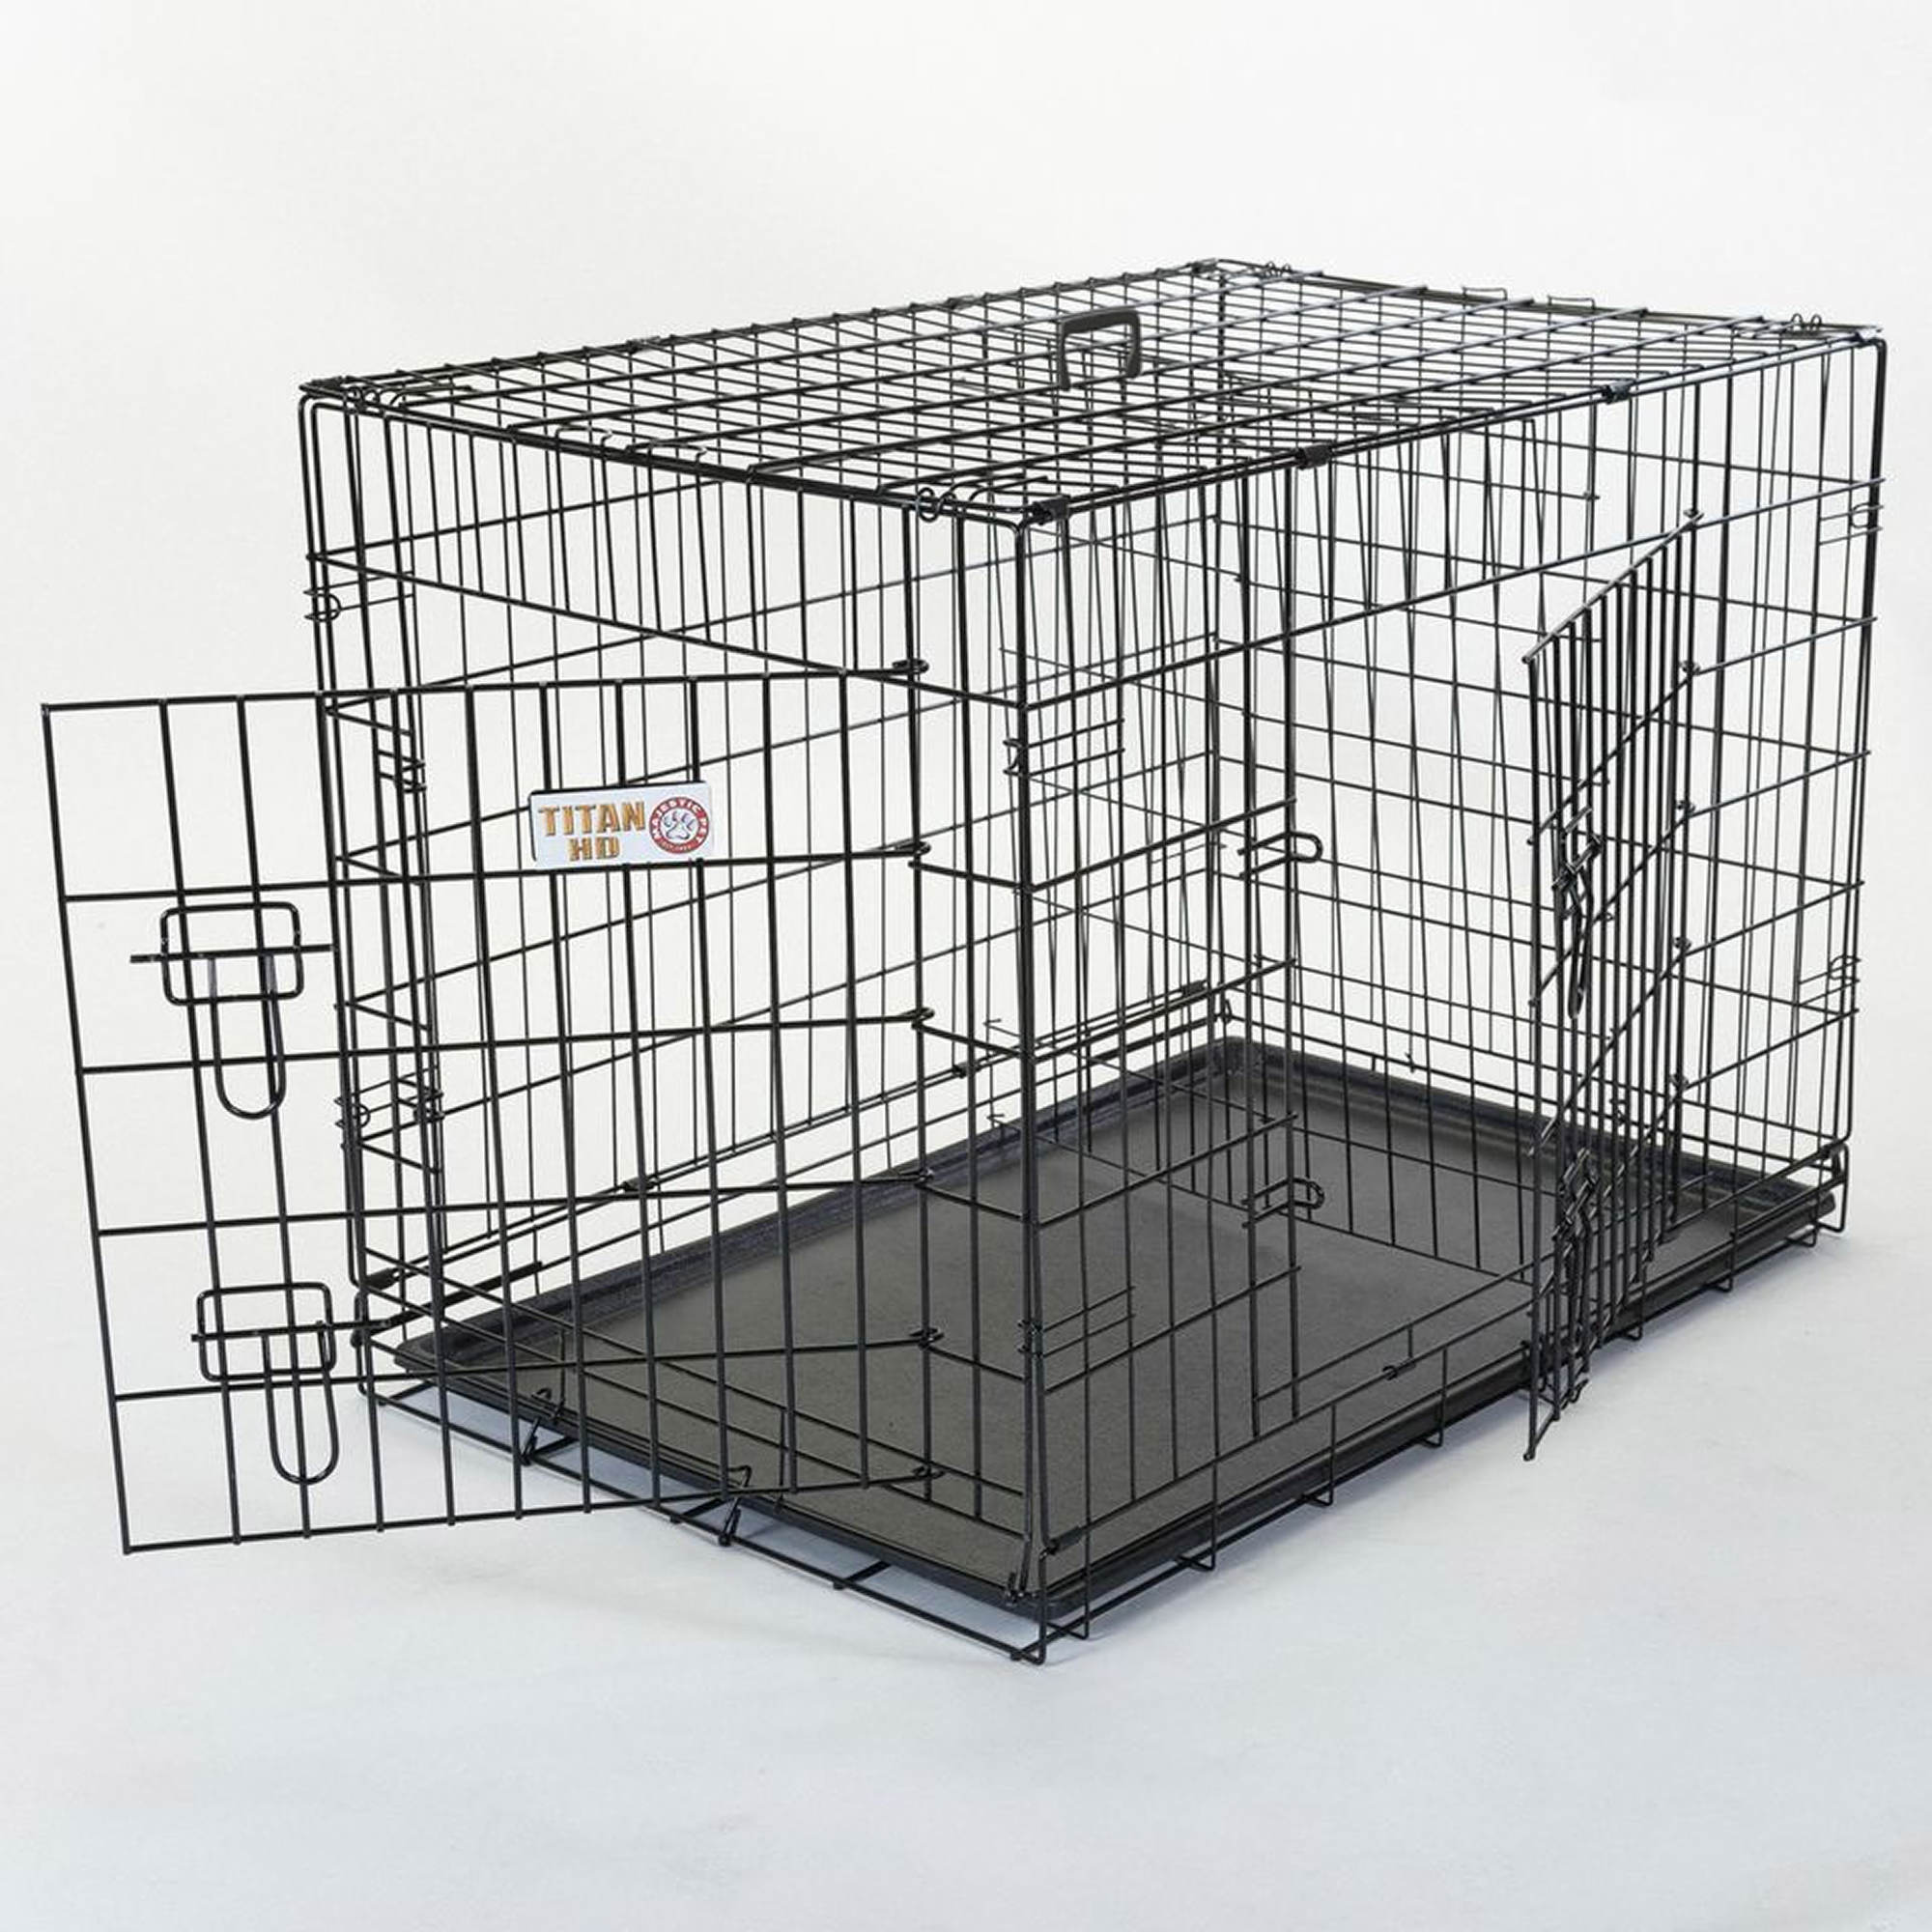 Bjs Wholesale Club Product